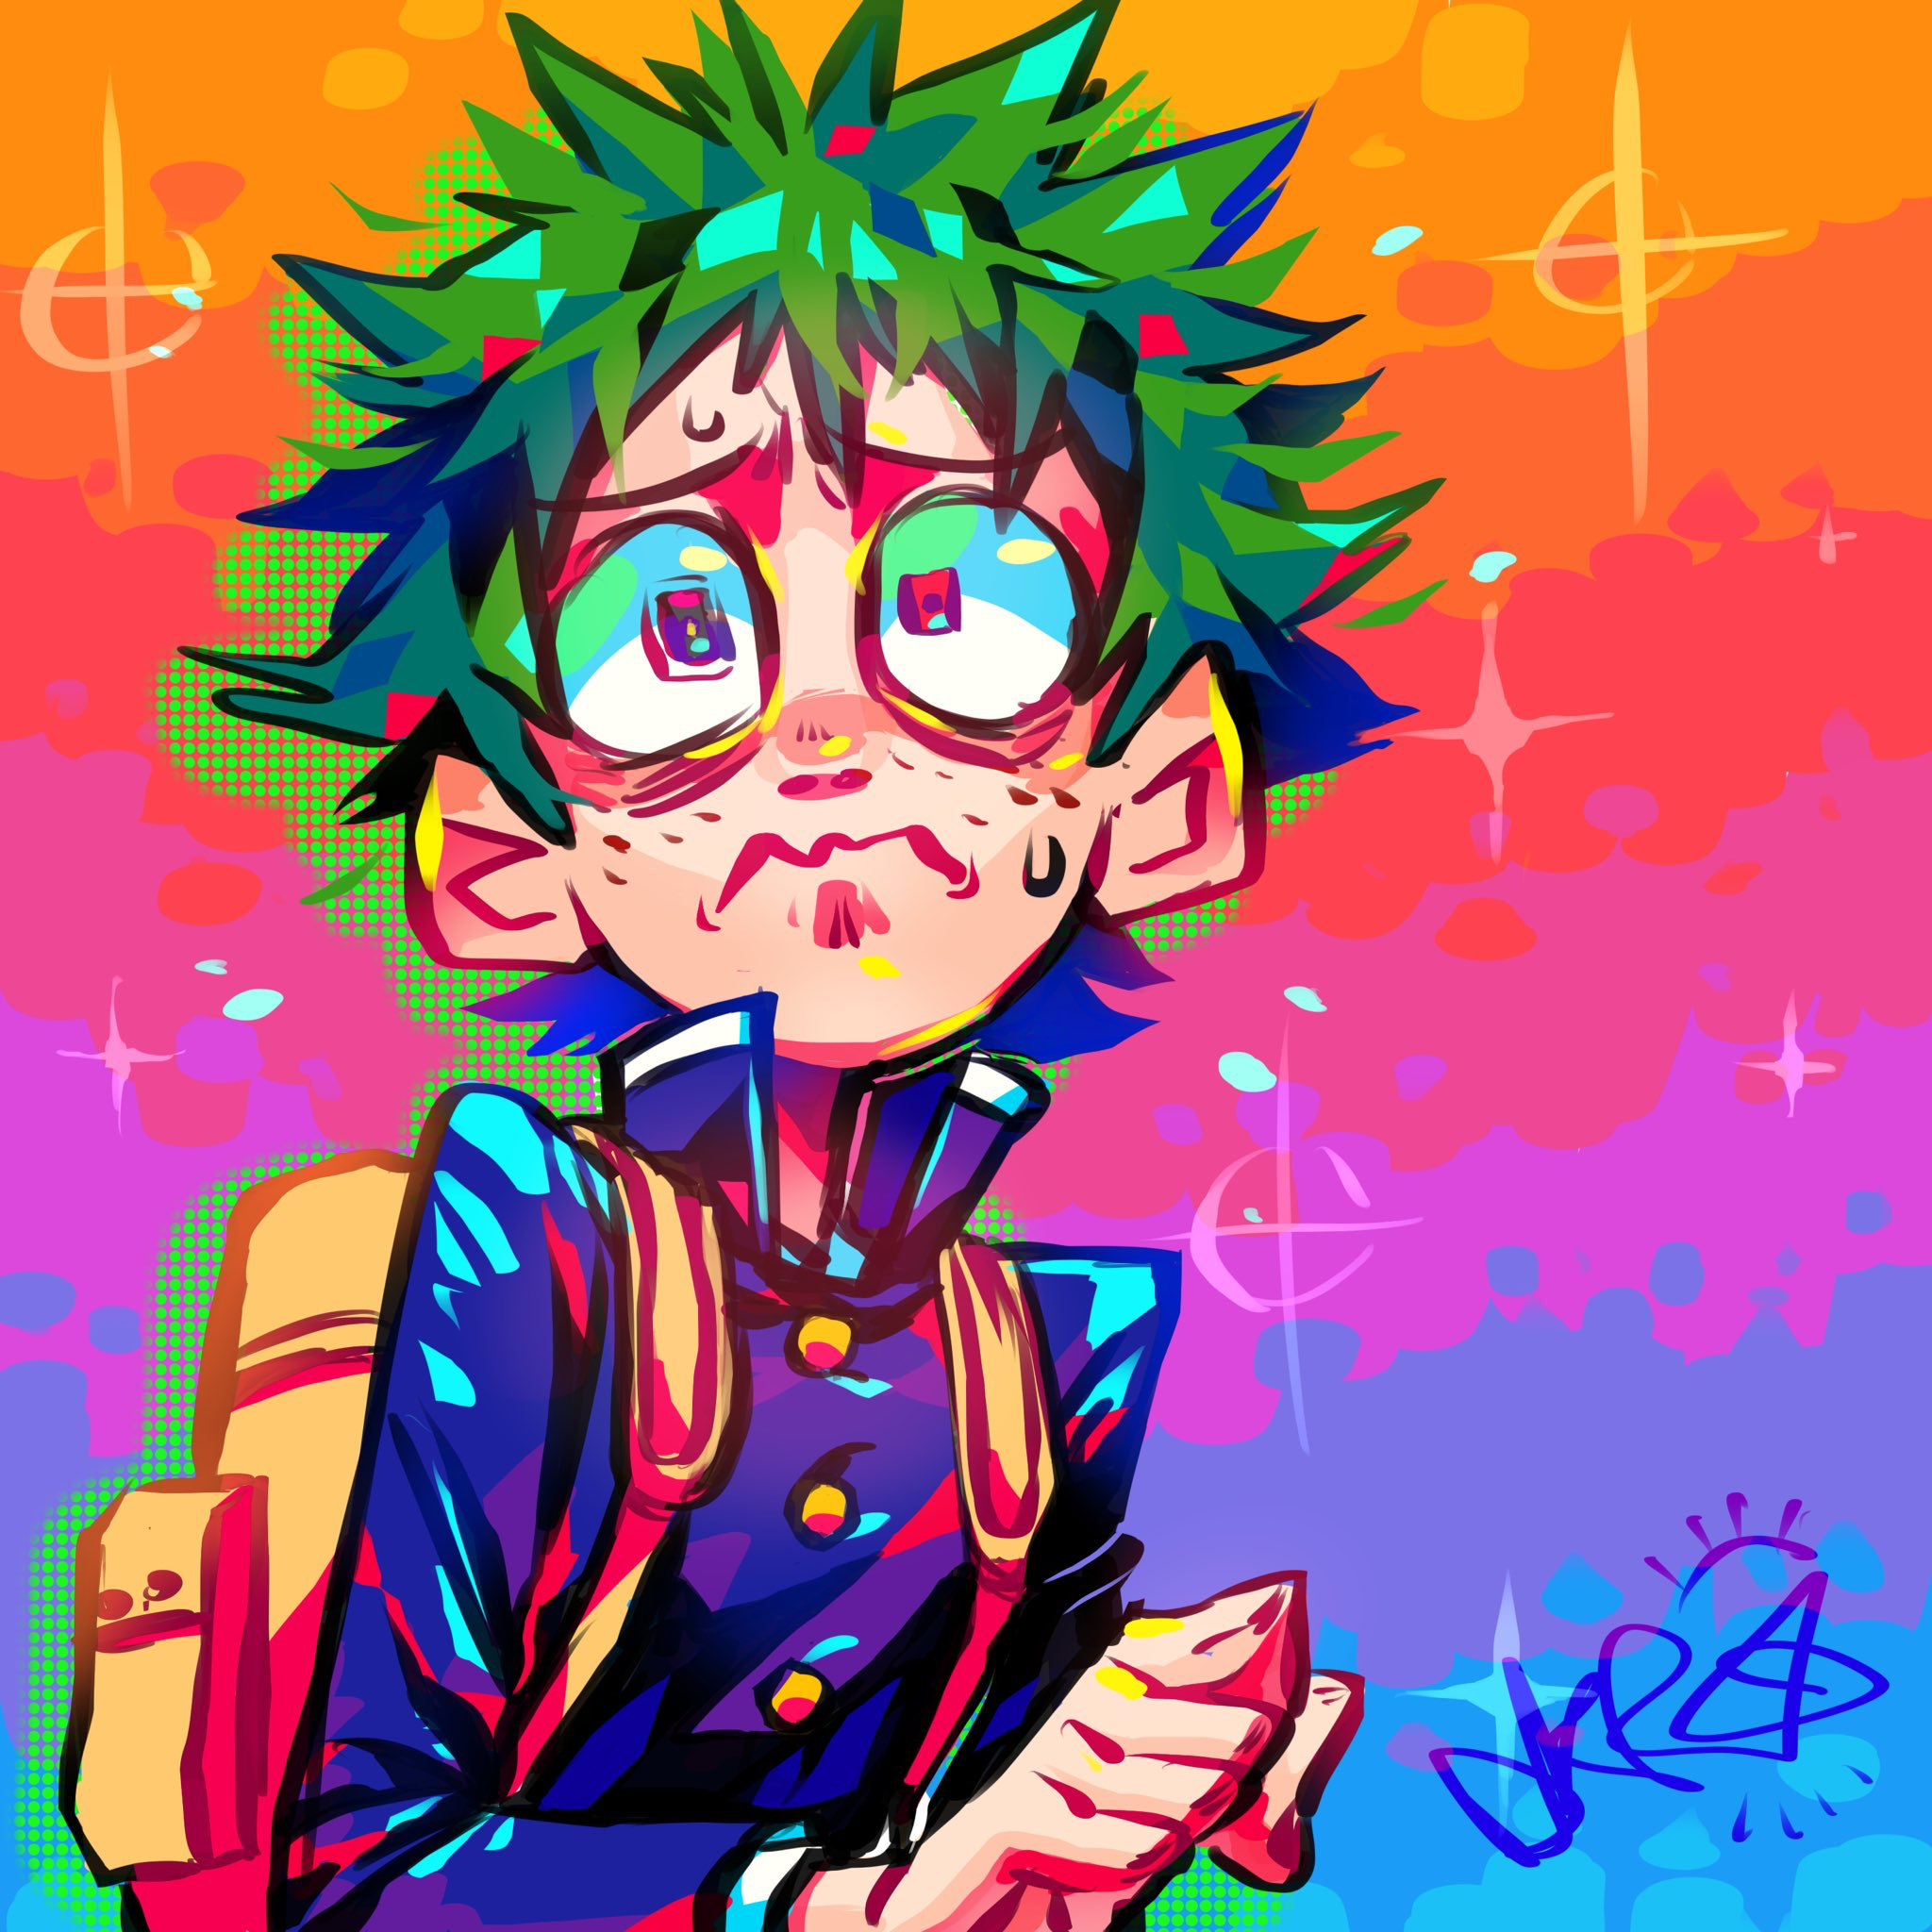 Artist Krooked_Glasses on twitter Character art, Cute